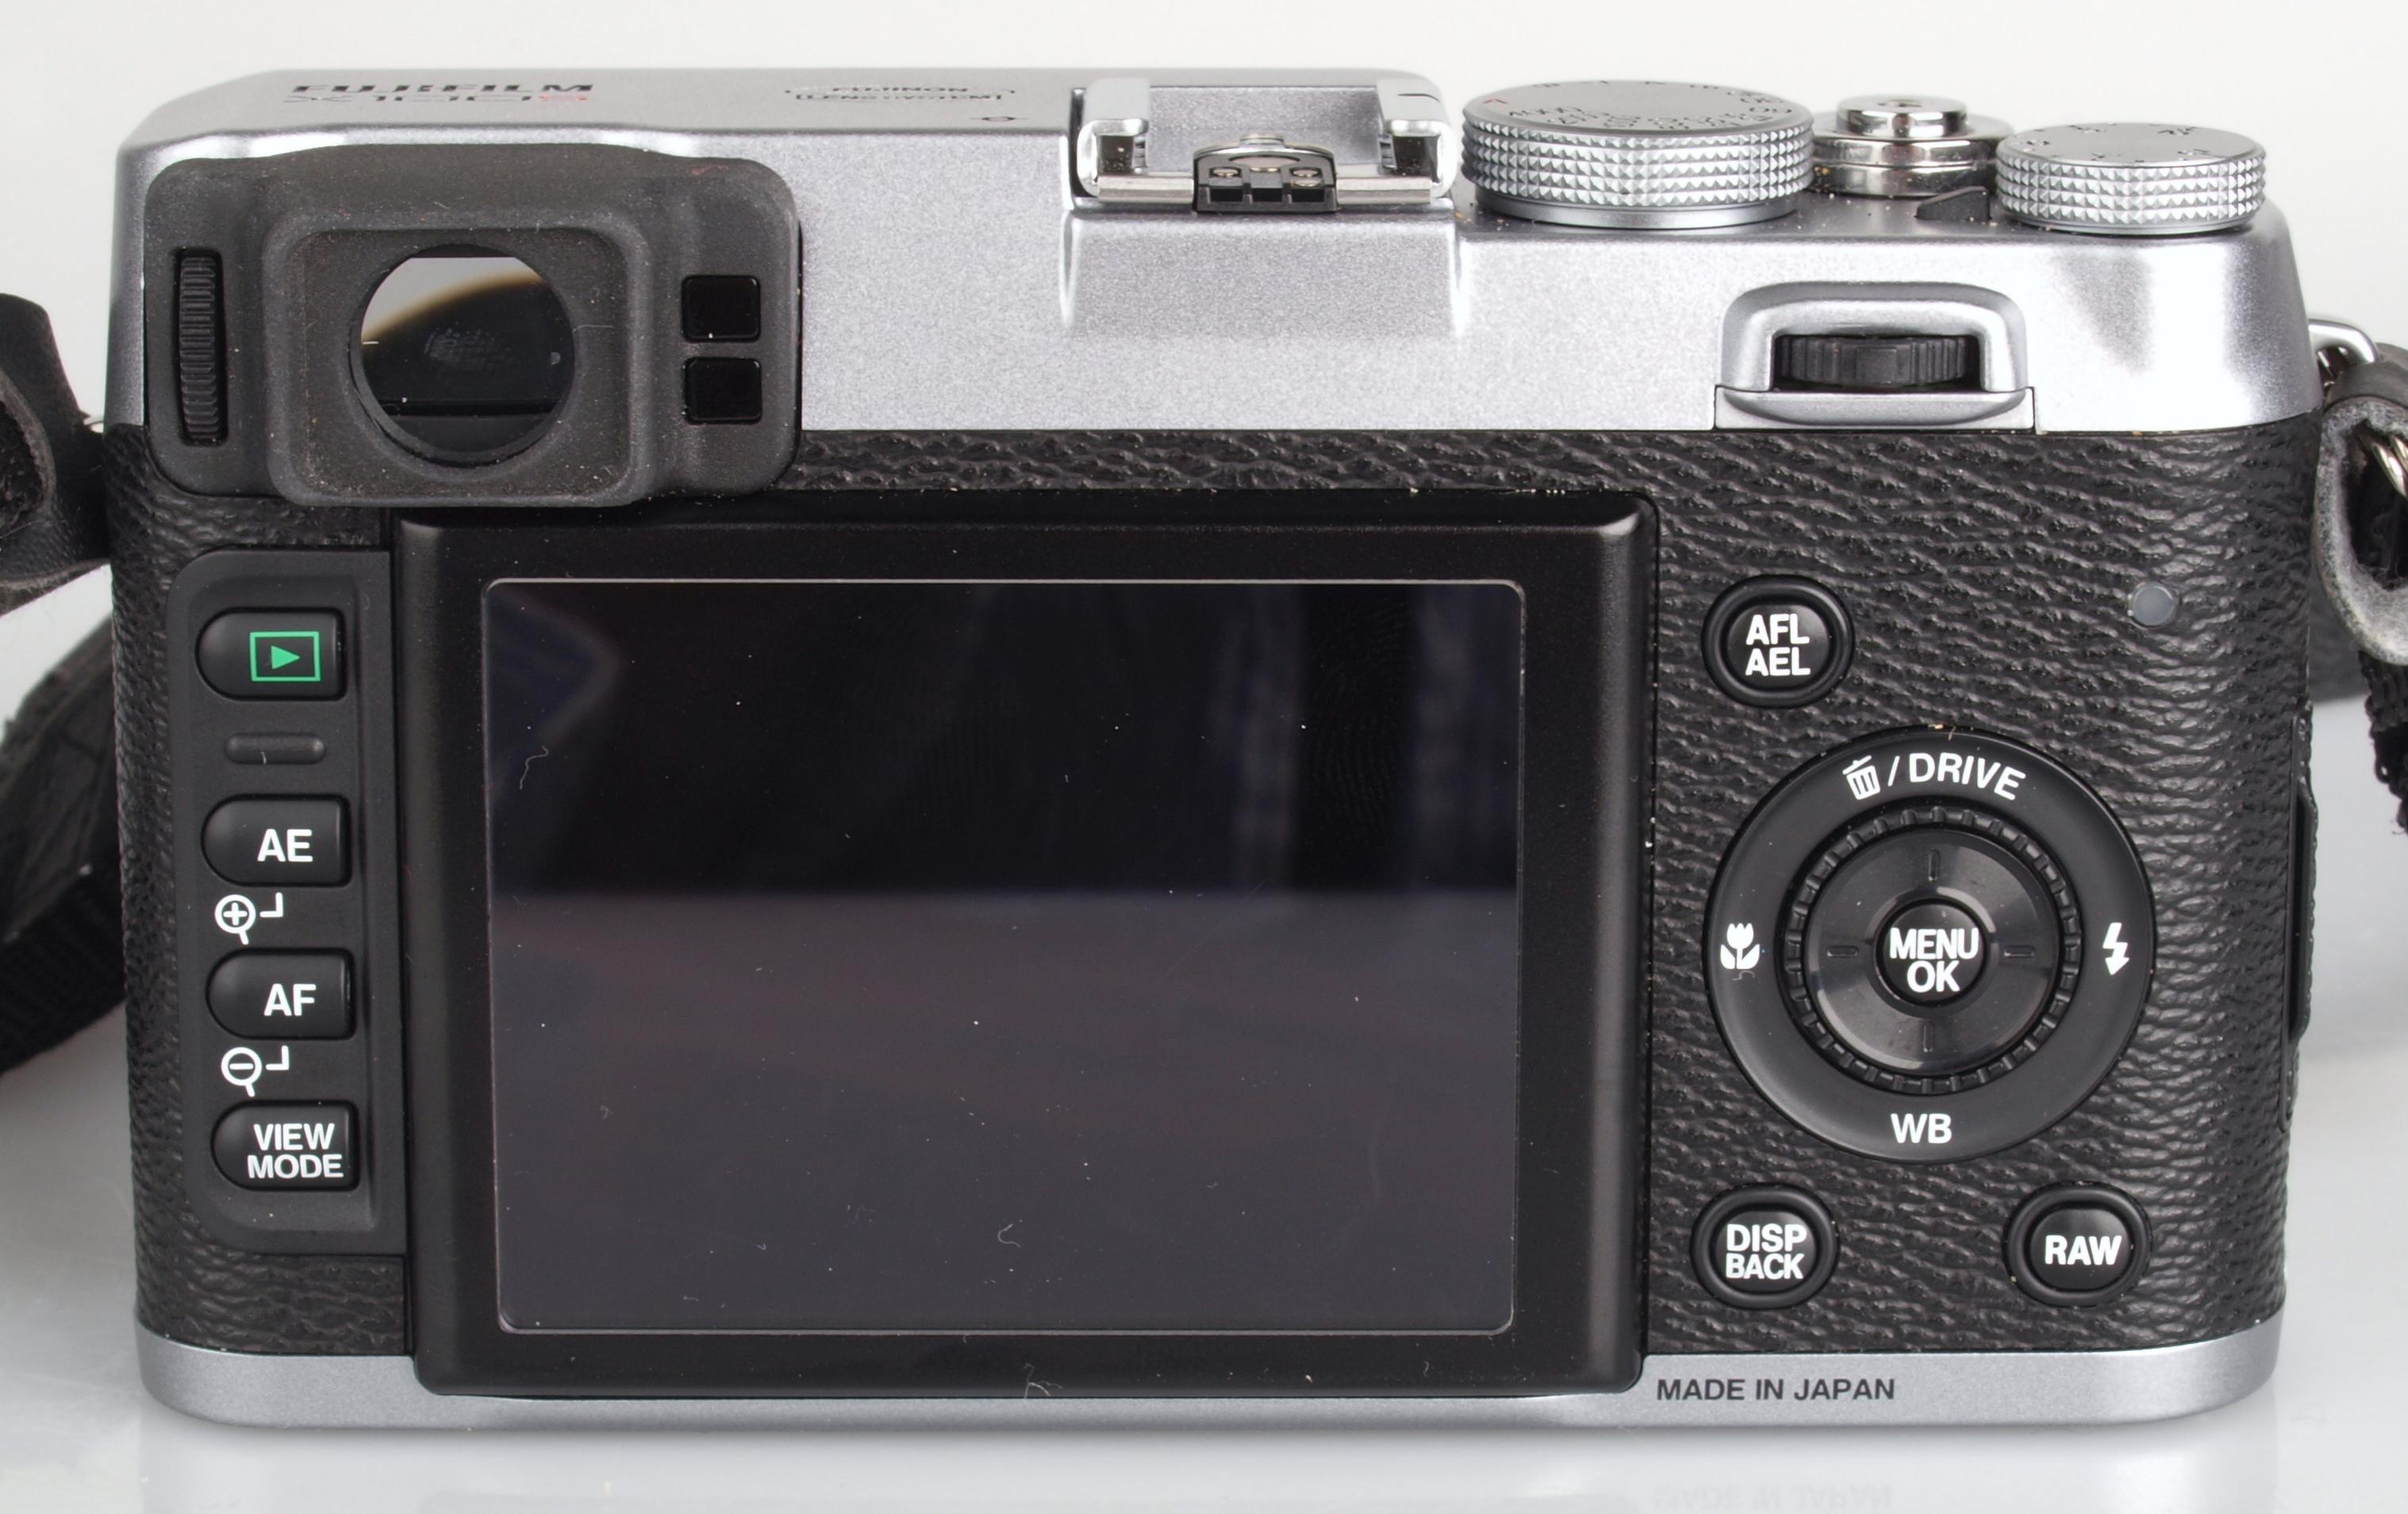 富士x100富士x100s_Fujifilm X100s (10)